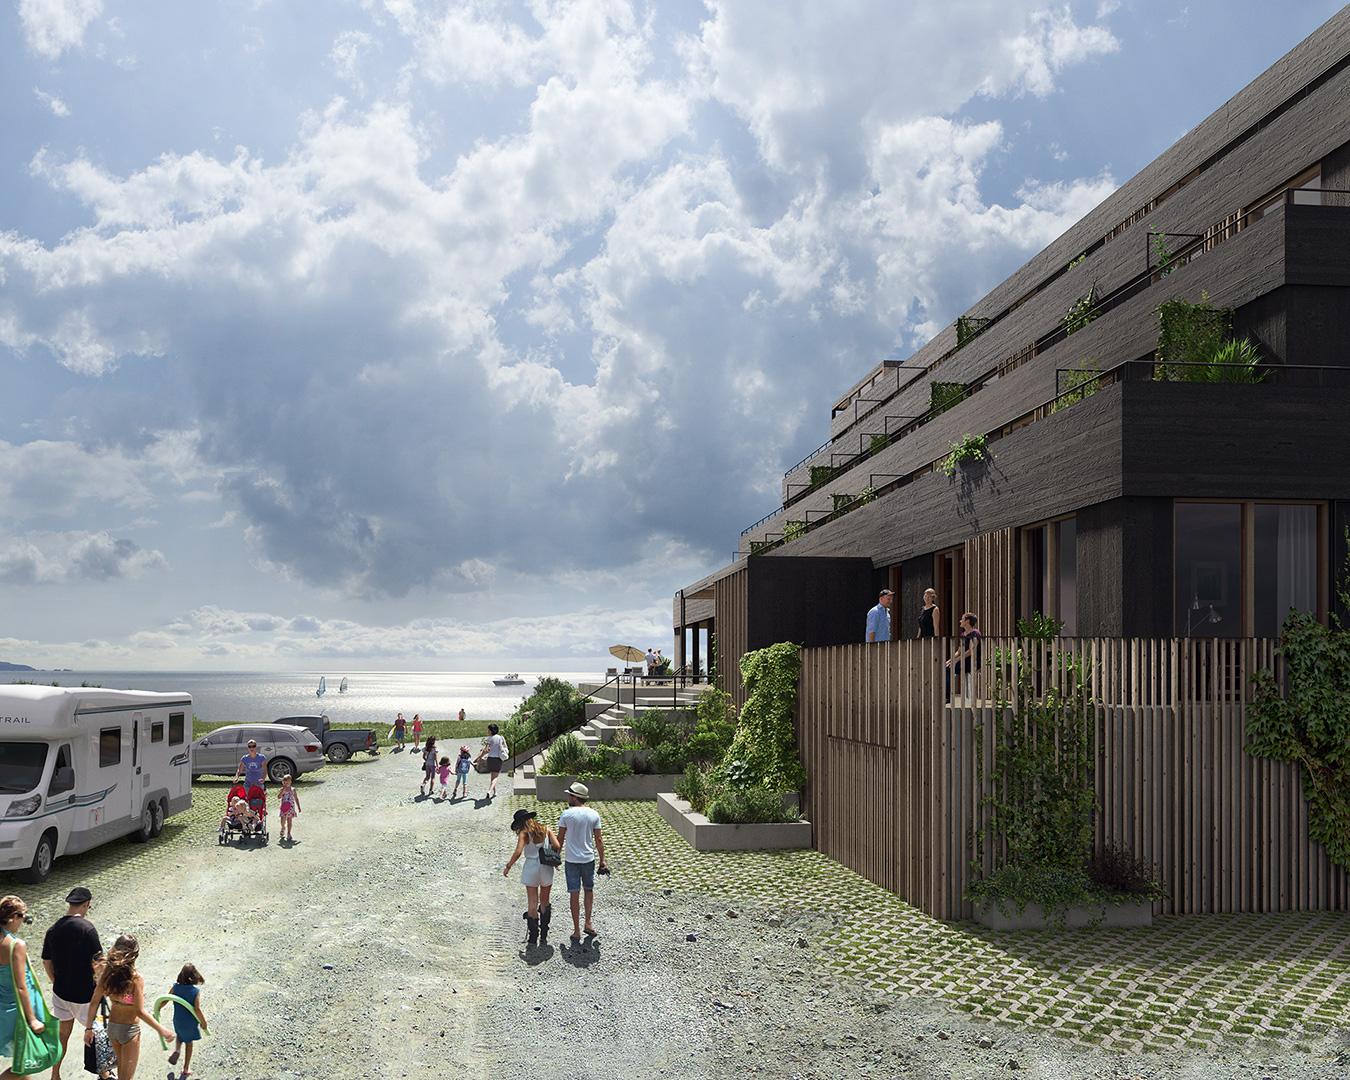 fridas-hotel-beachview-sweden-commercial-exterior-rendering-copyright-www-kaiserbold-com